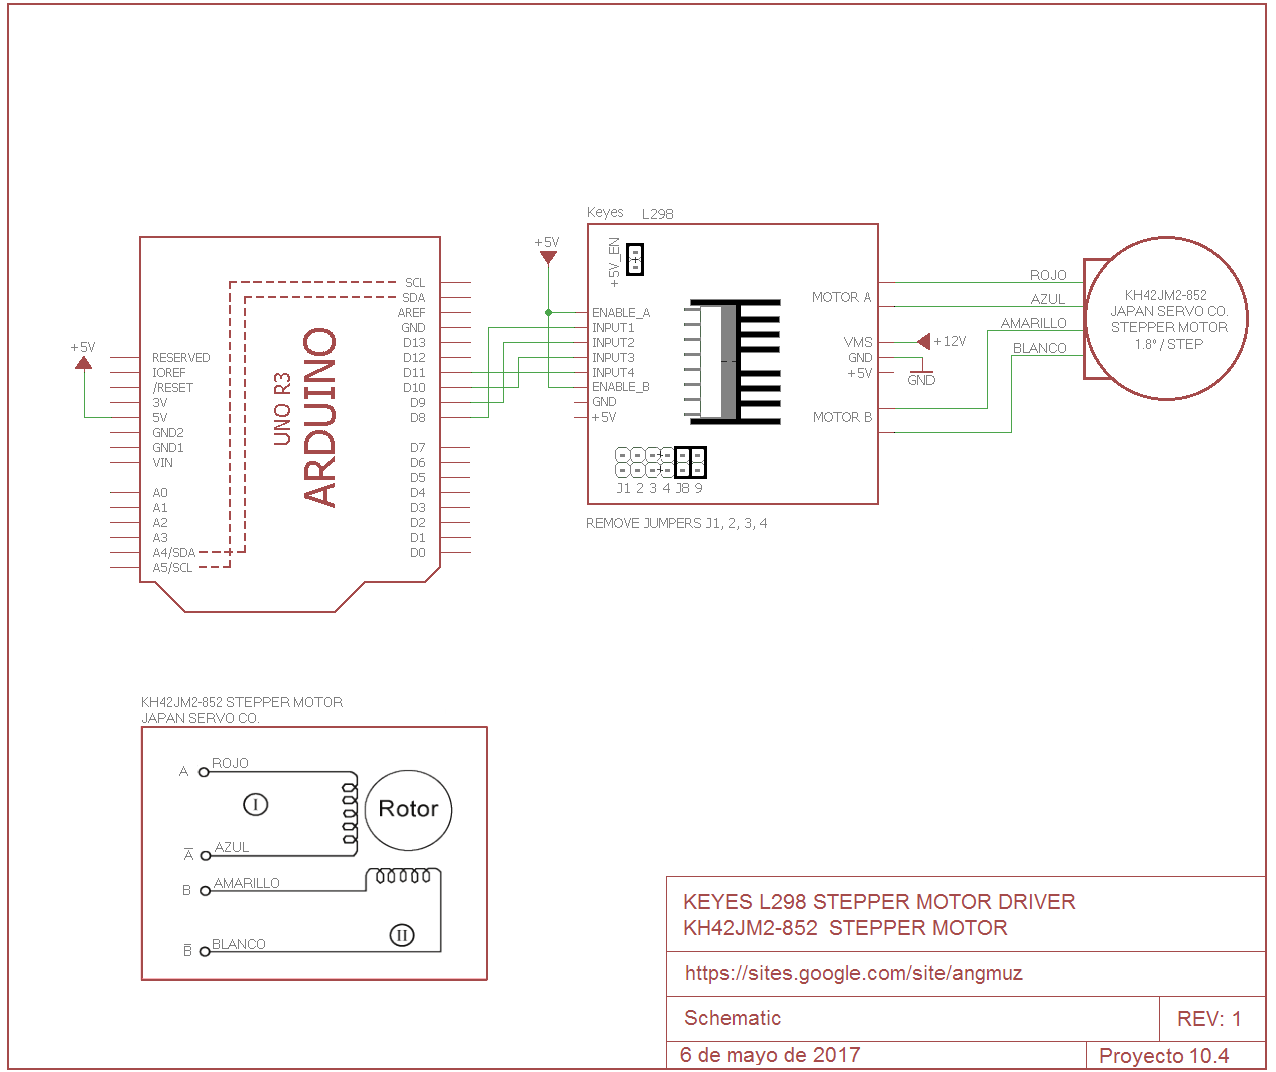 Maximo Ingenio: Keyes L298 Stepper Motor Driver on